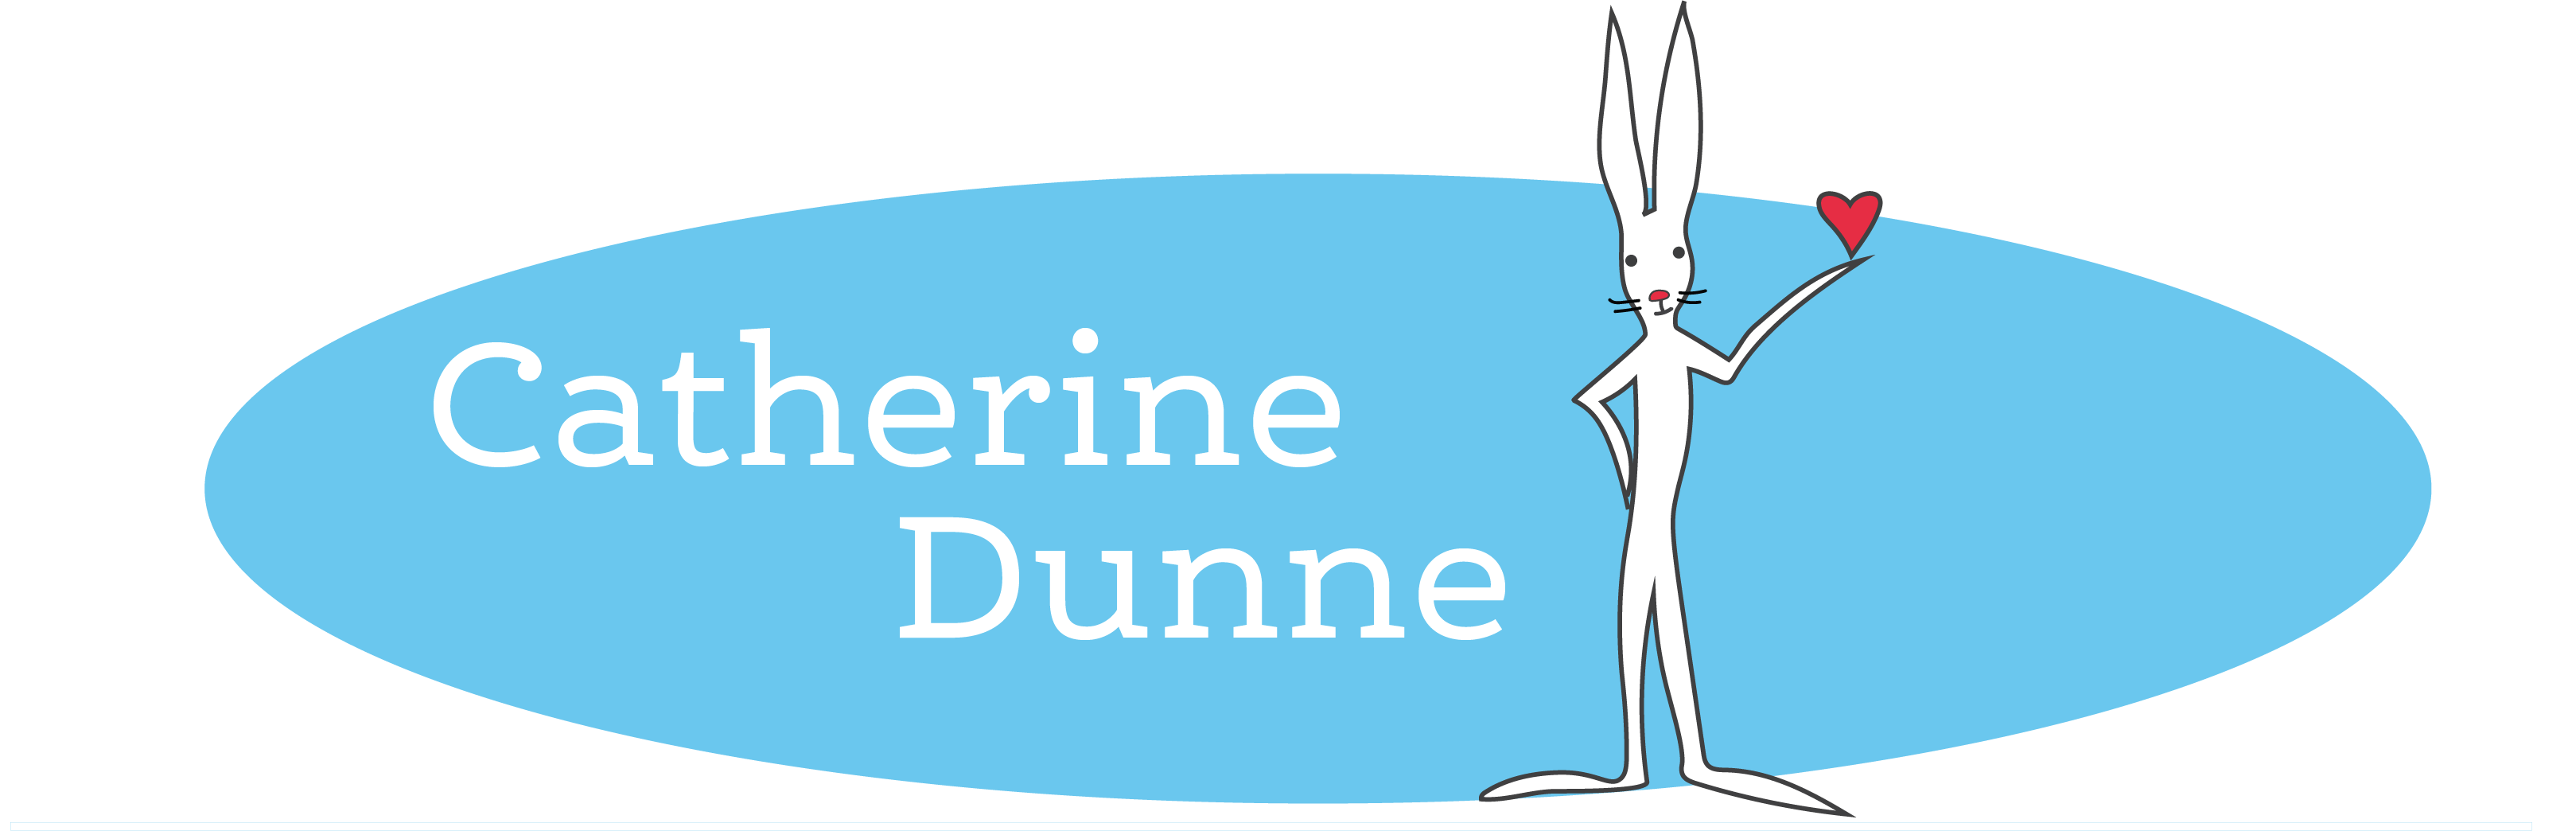 catherine dunne irish greeting cards